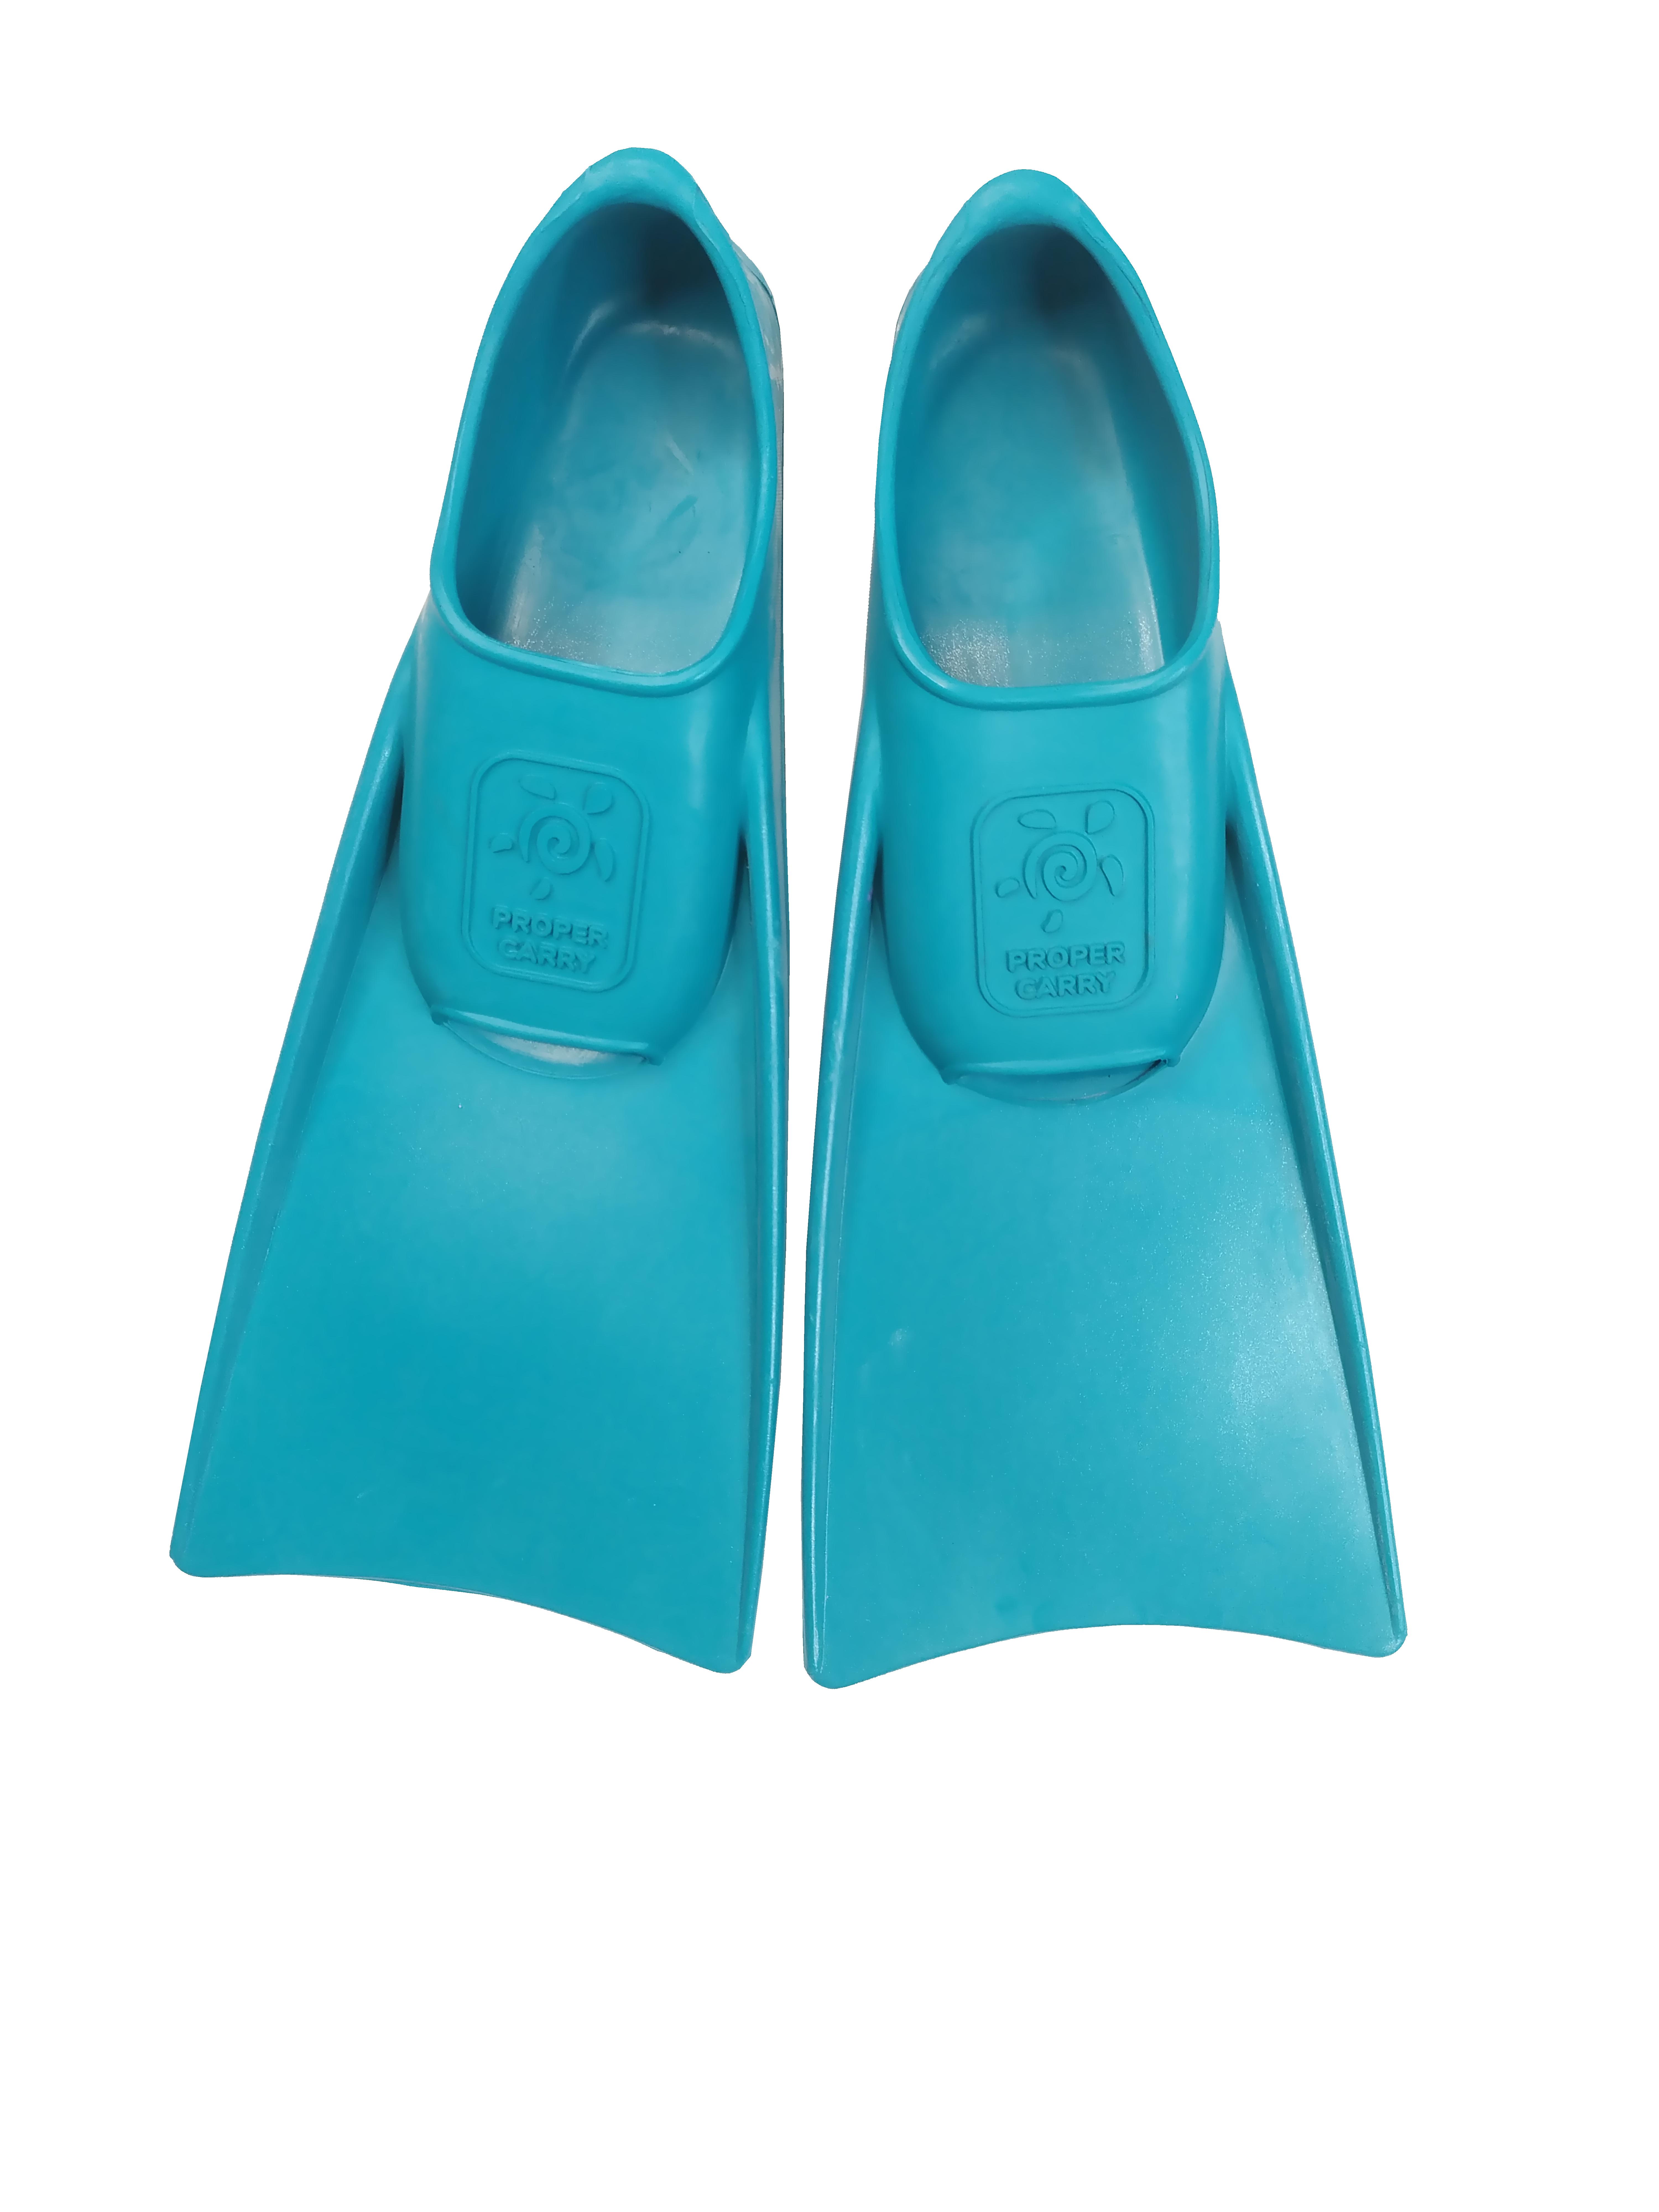 Детские ласты для плавания Proper-Carry Super Elastic р. 21-22, 23-24, 25-26, 27-28, 29-30, - фото 1